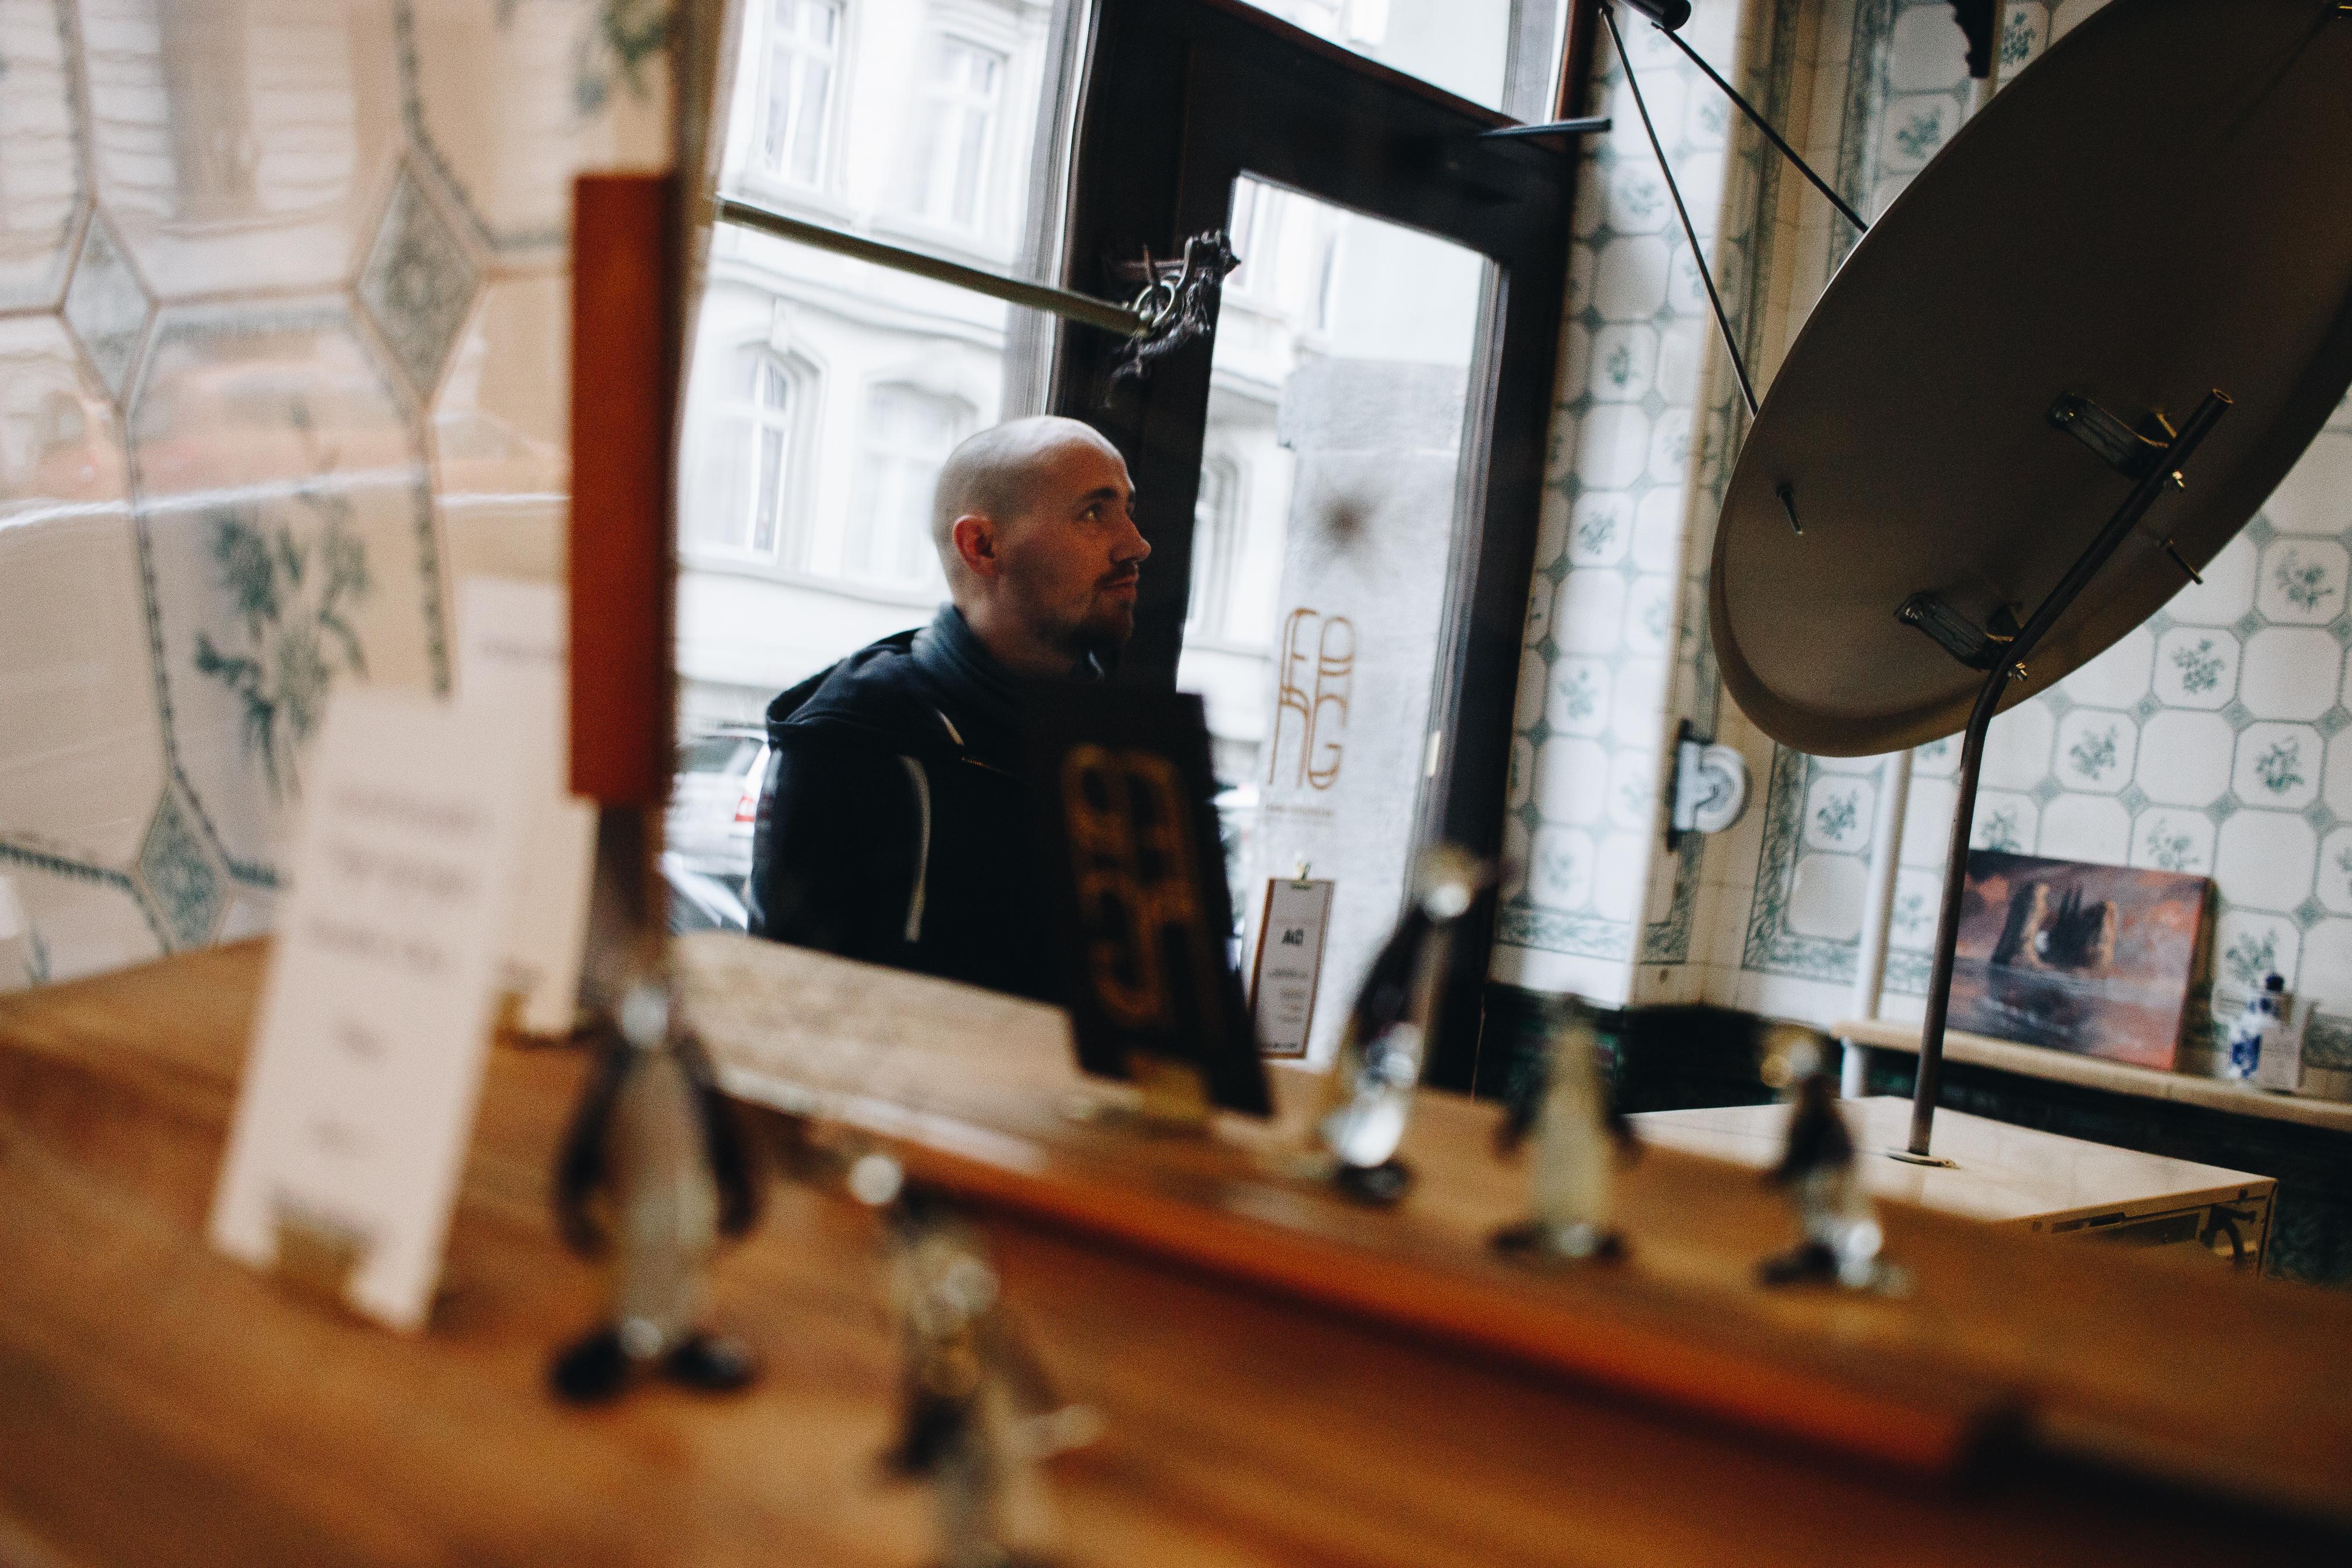 studio fang-grafik-design-reudnitz-annabelle sagt-leipzig24